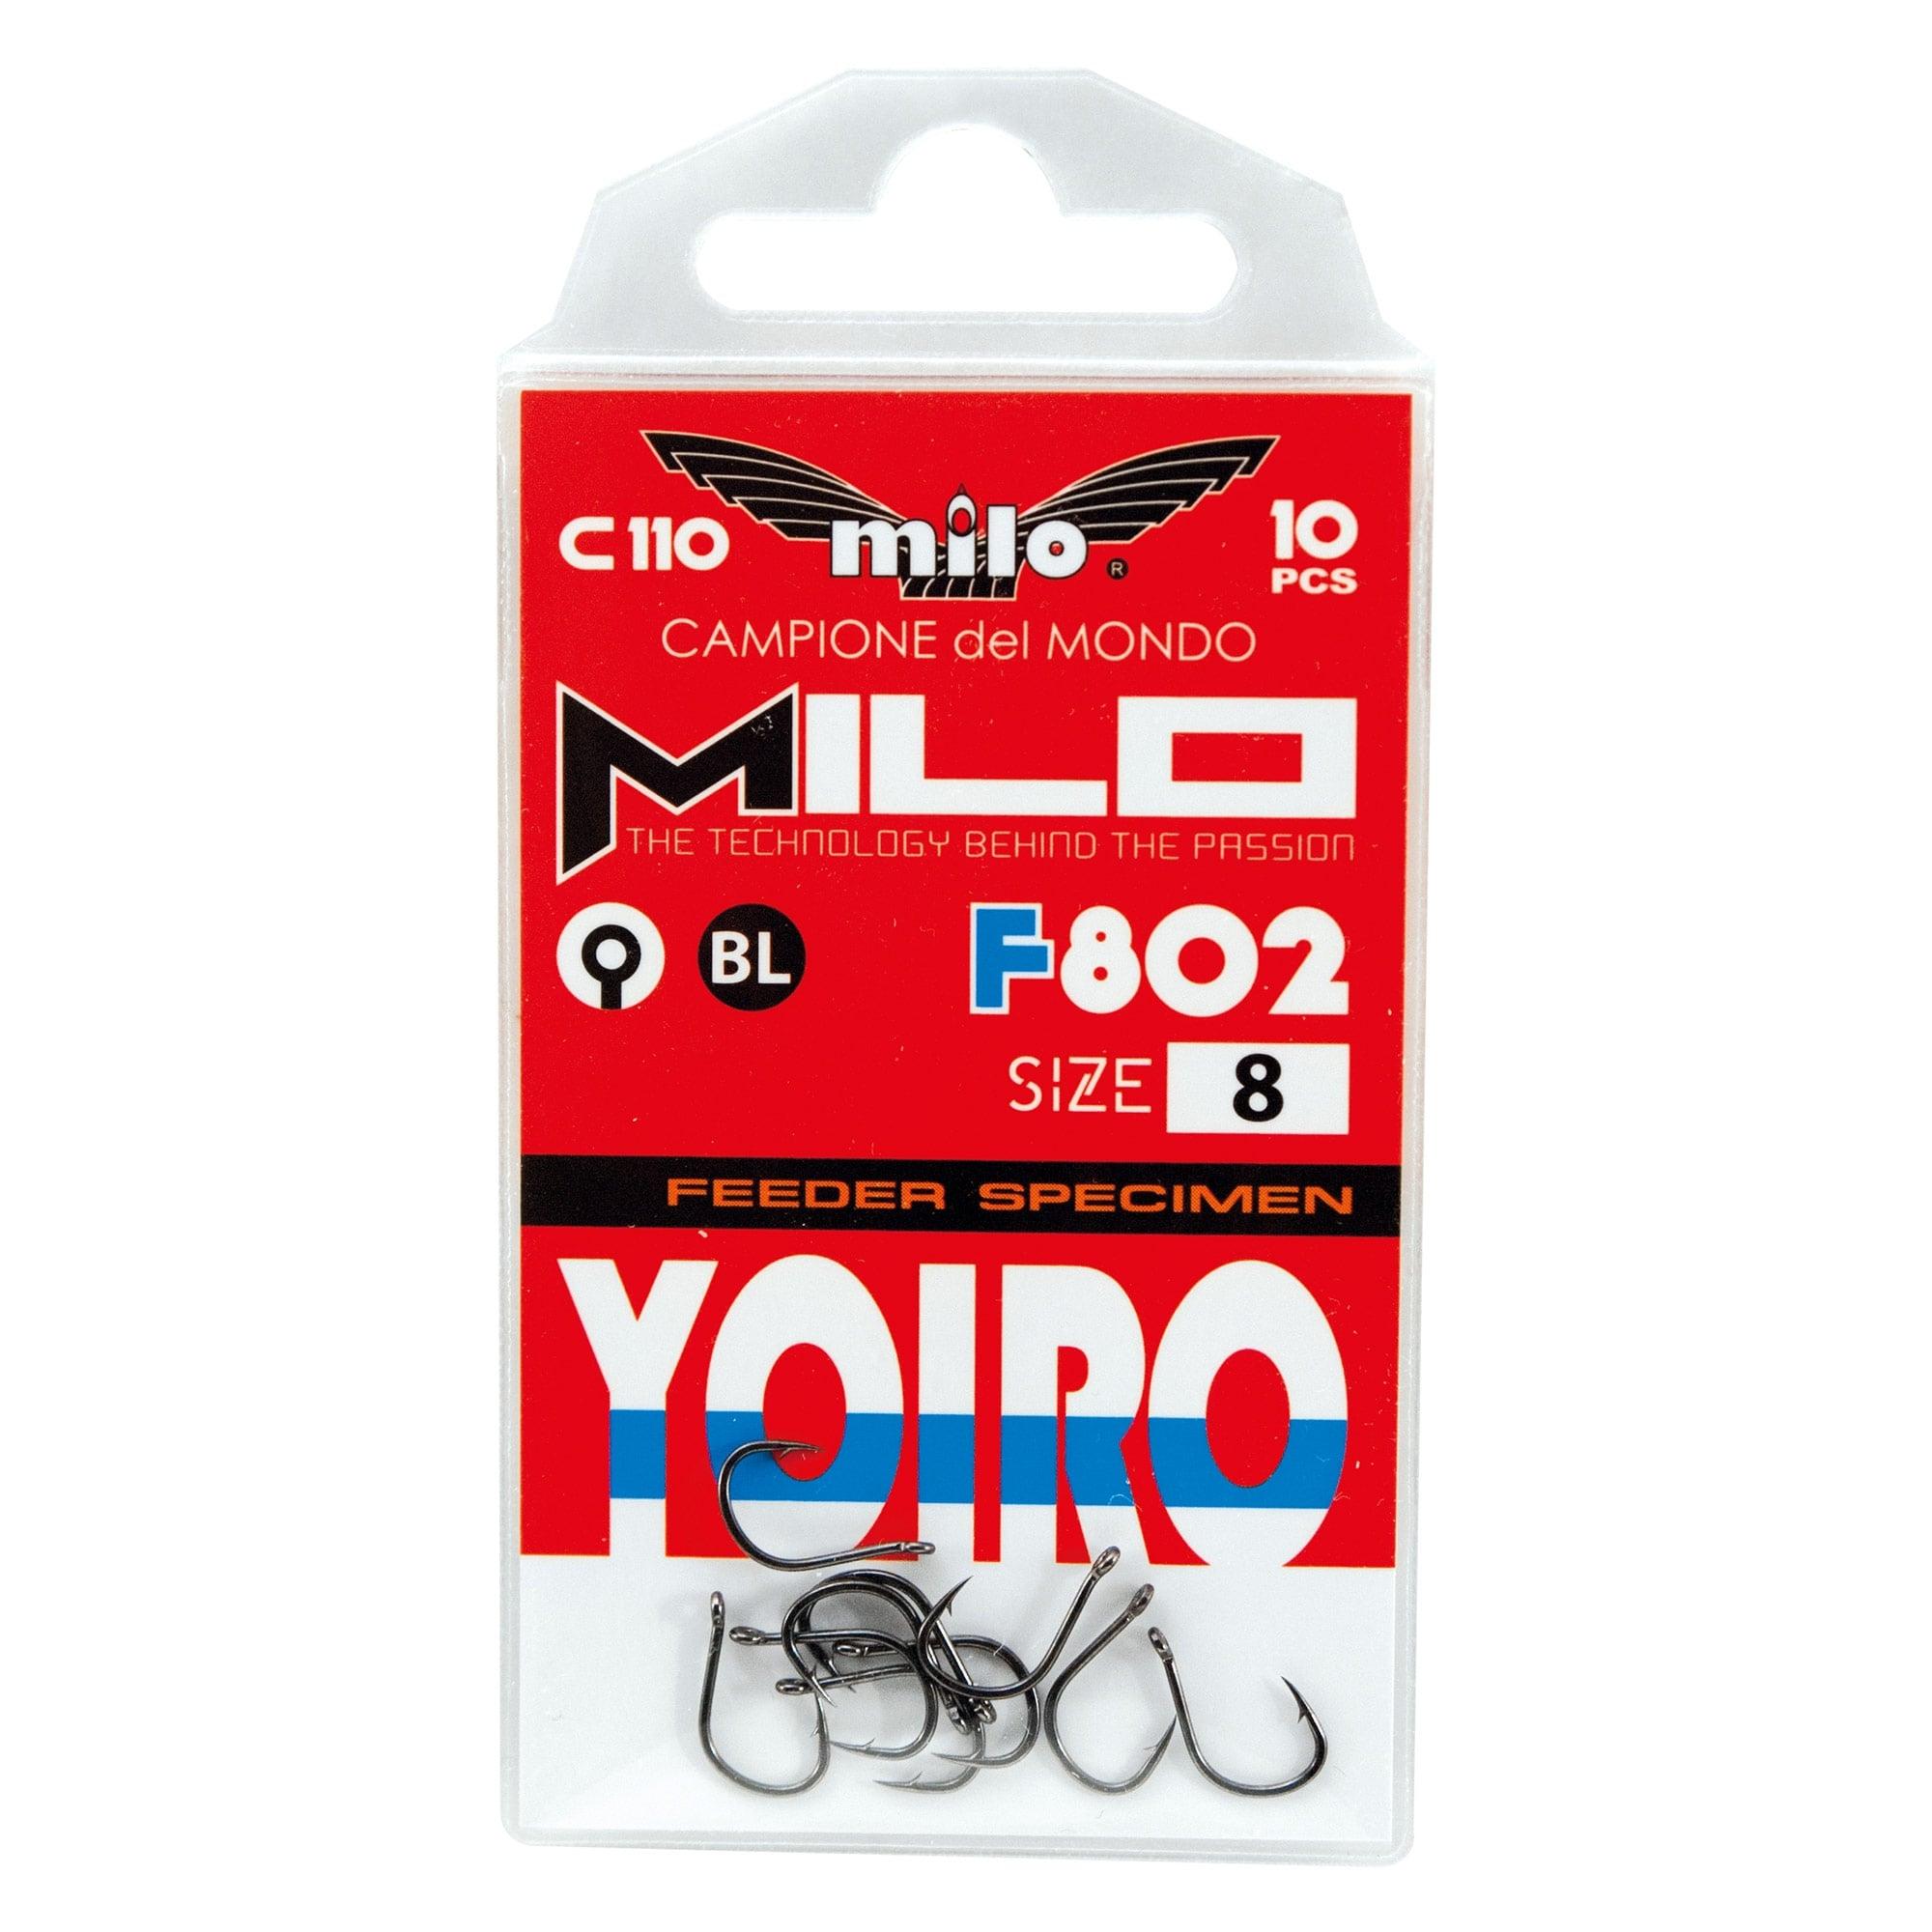 AMI YOIRO F802 Bl Feeder Special MILO (10pz)